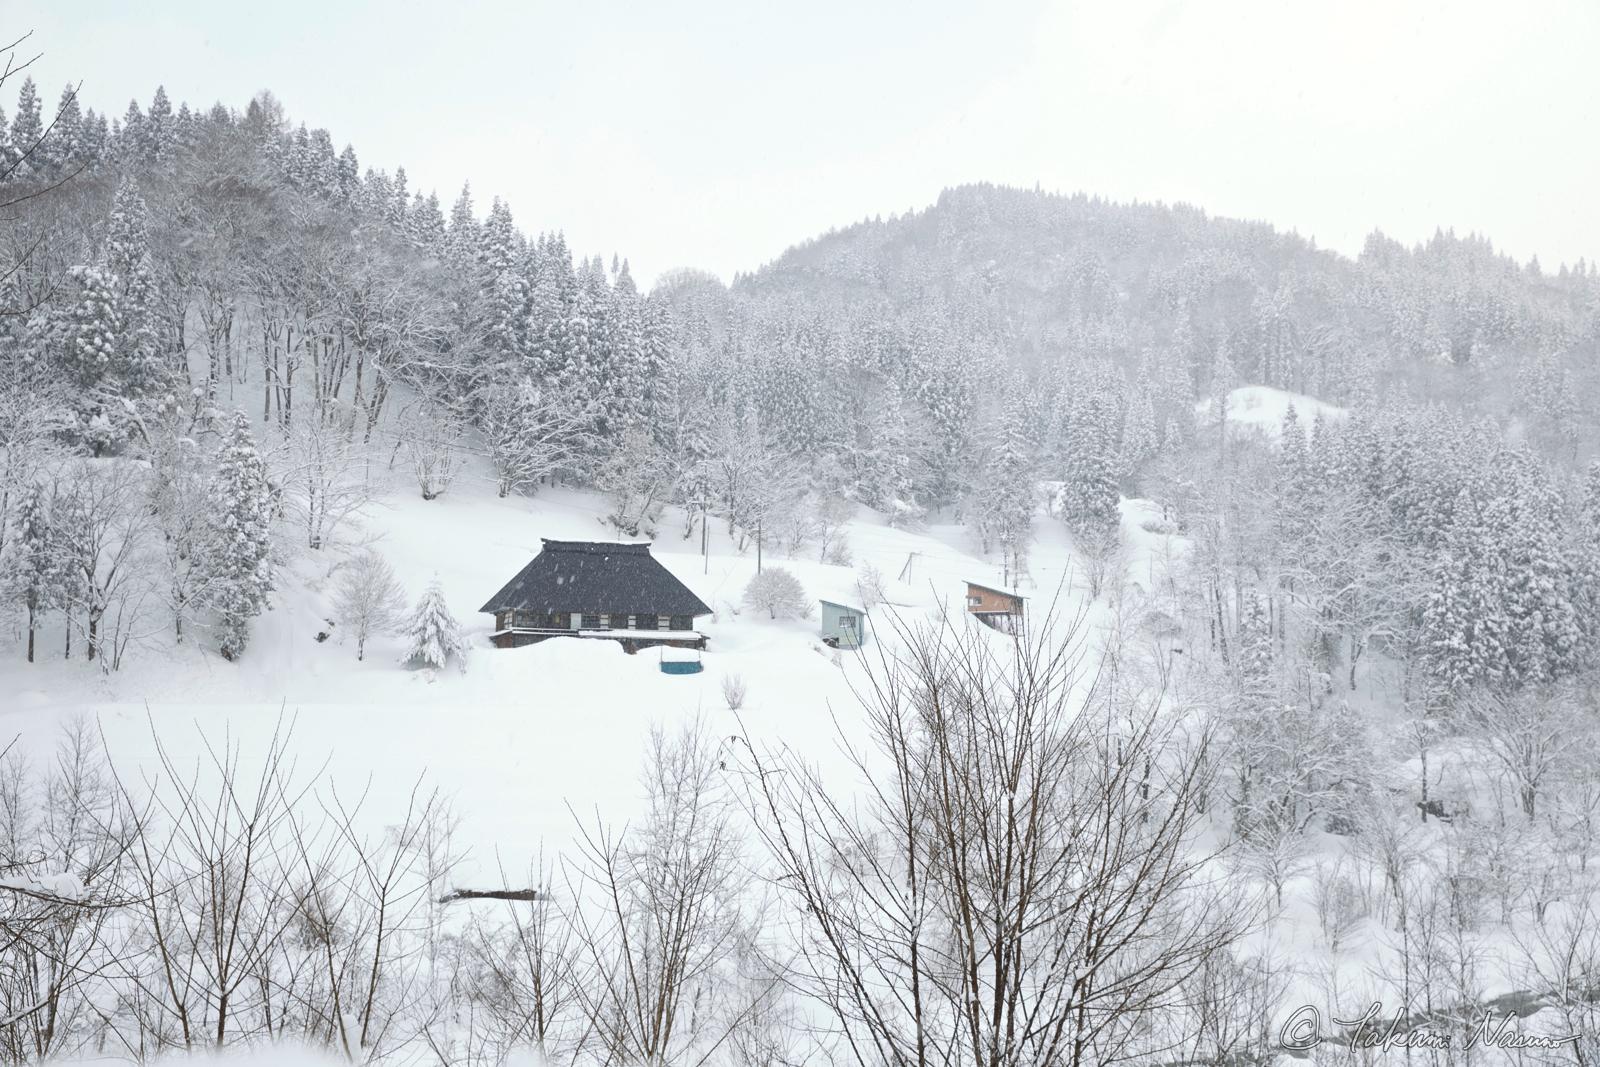 KOZUENOYUKI Guesthouse from a distance